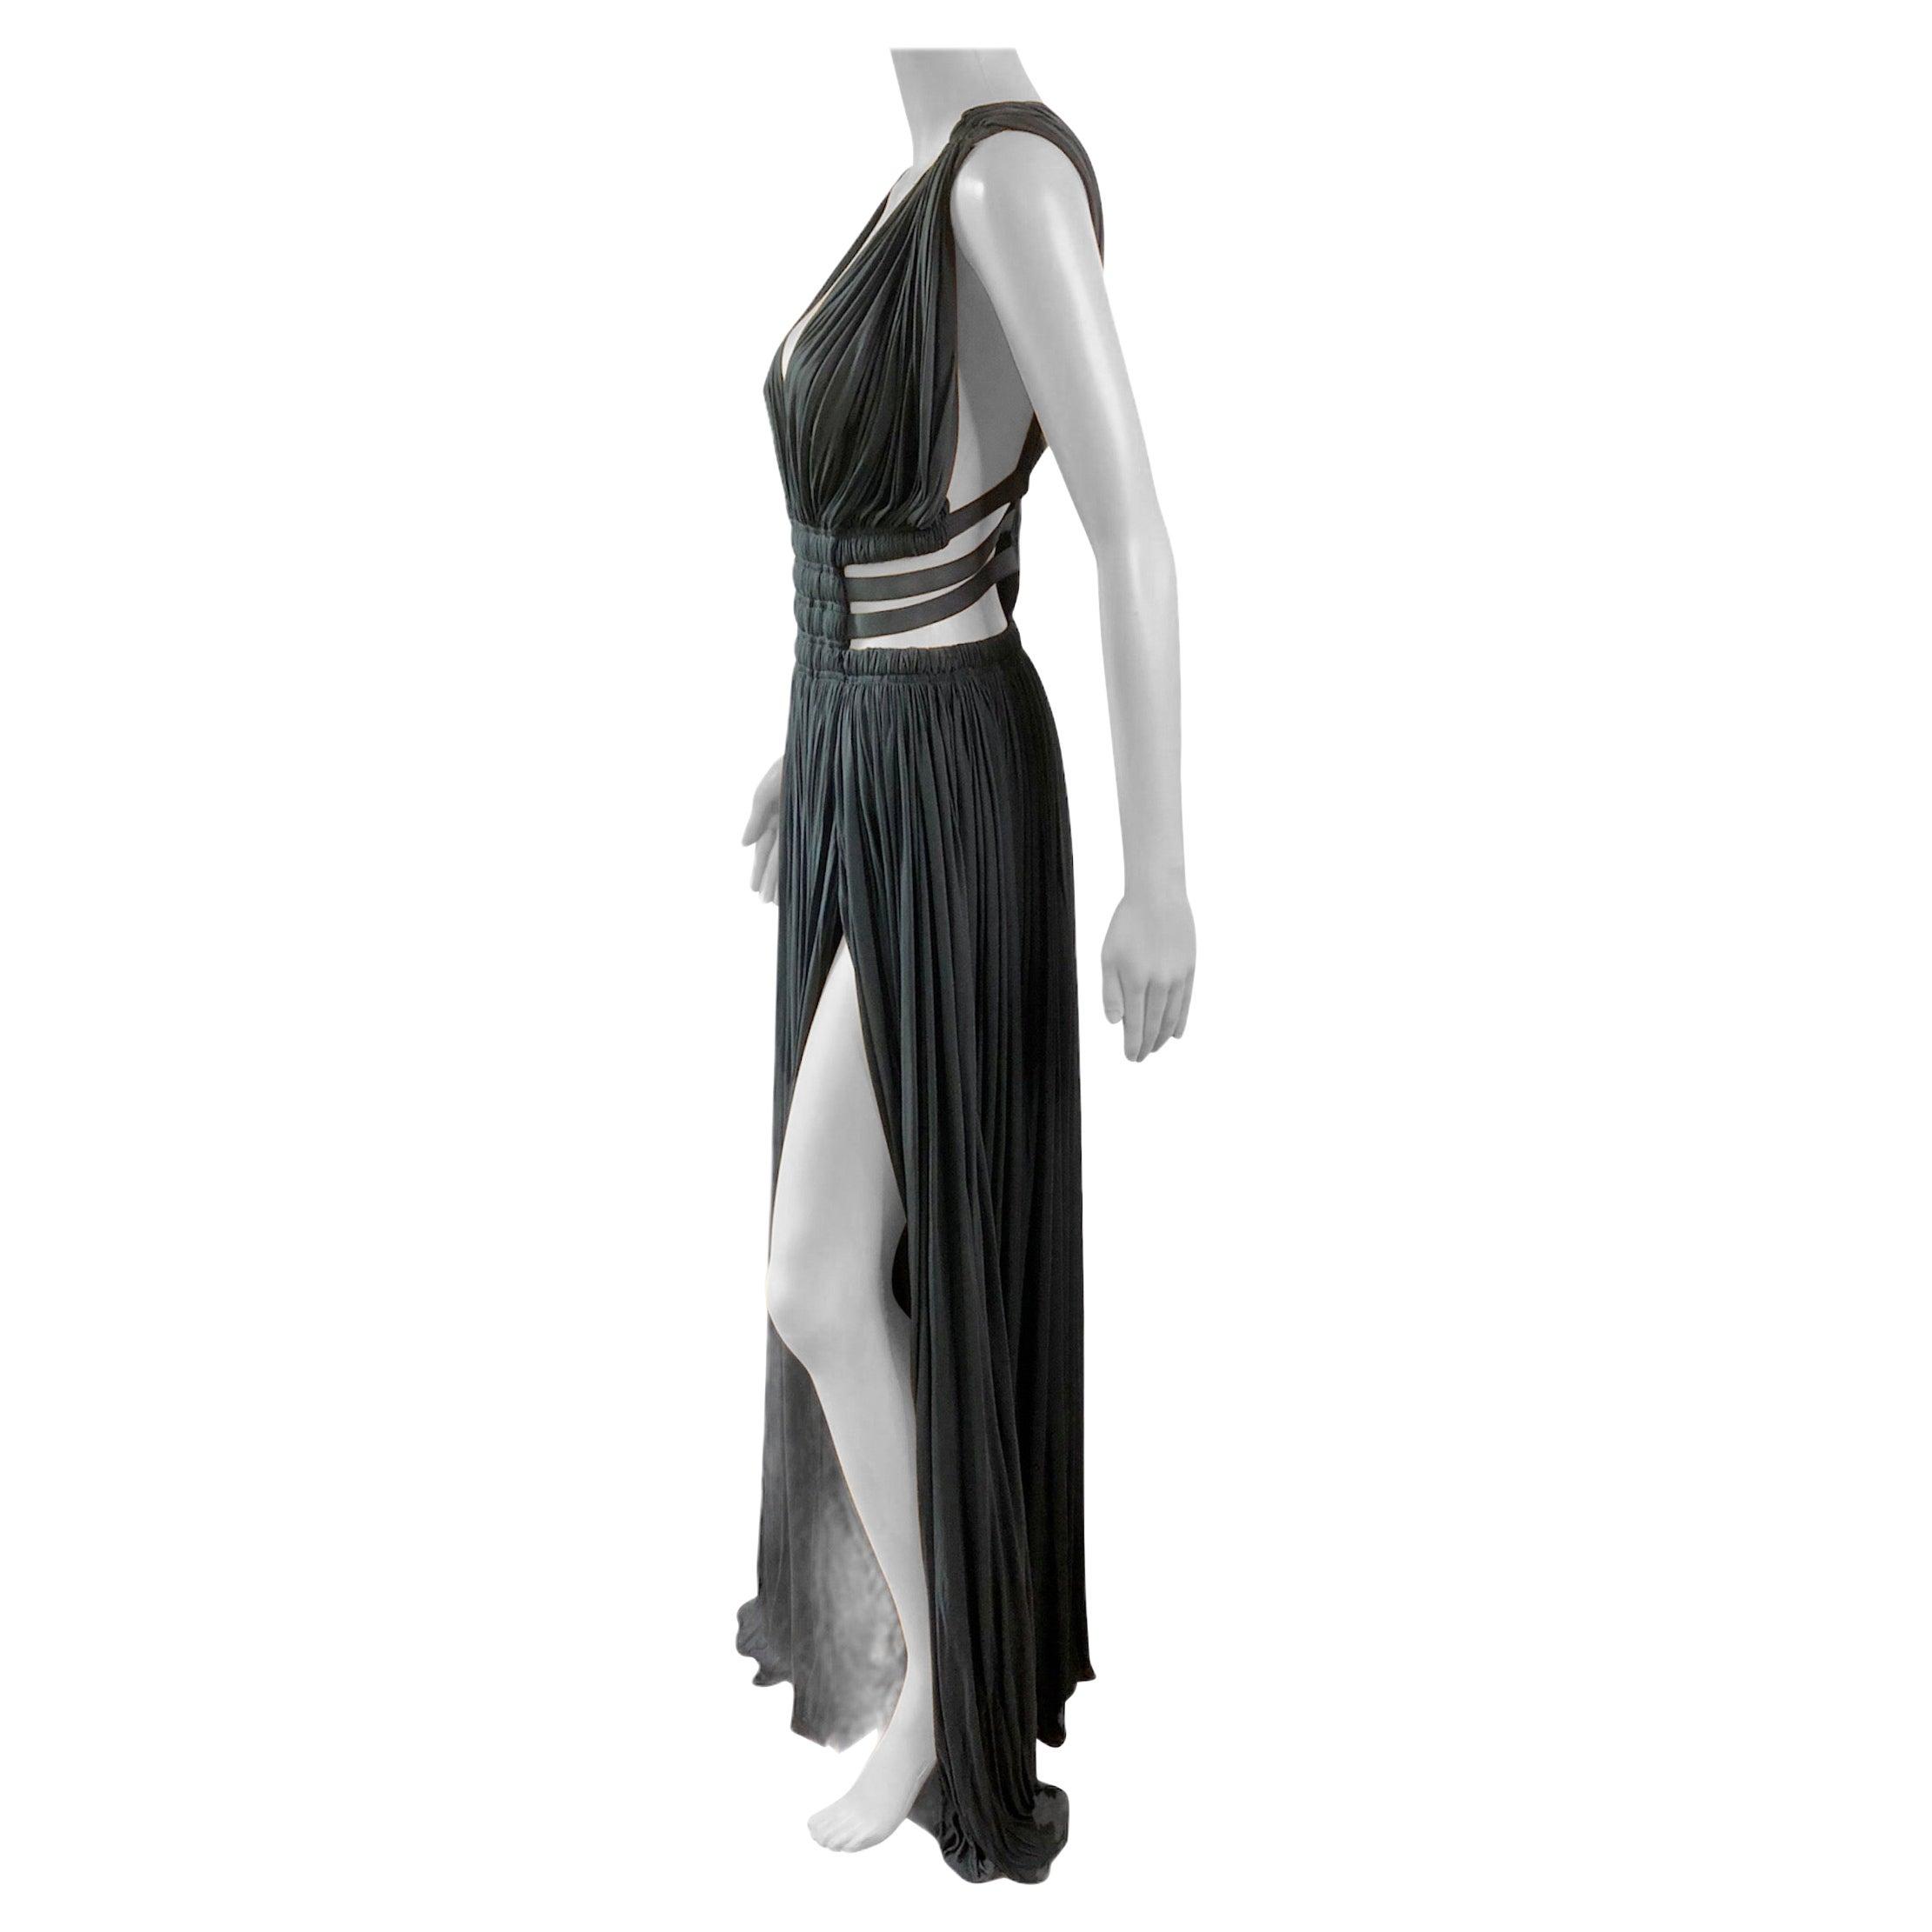 Azzedine Alaïa c.2004 Semi-Sheer Cutout Ruched Slits Gown Maxi Evening Dress